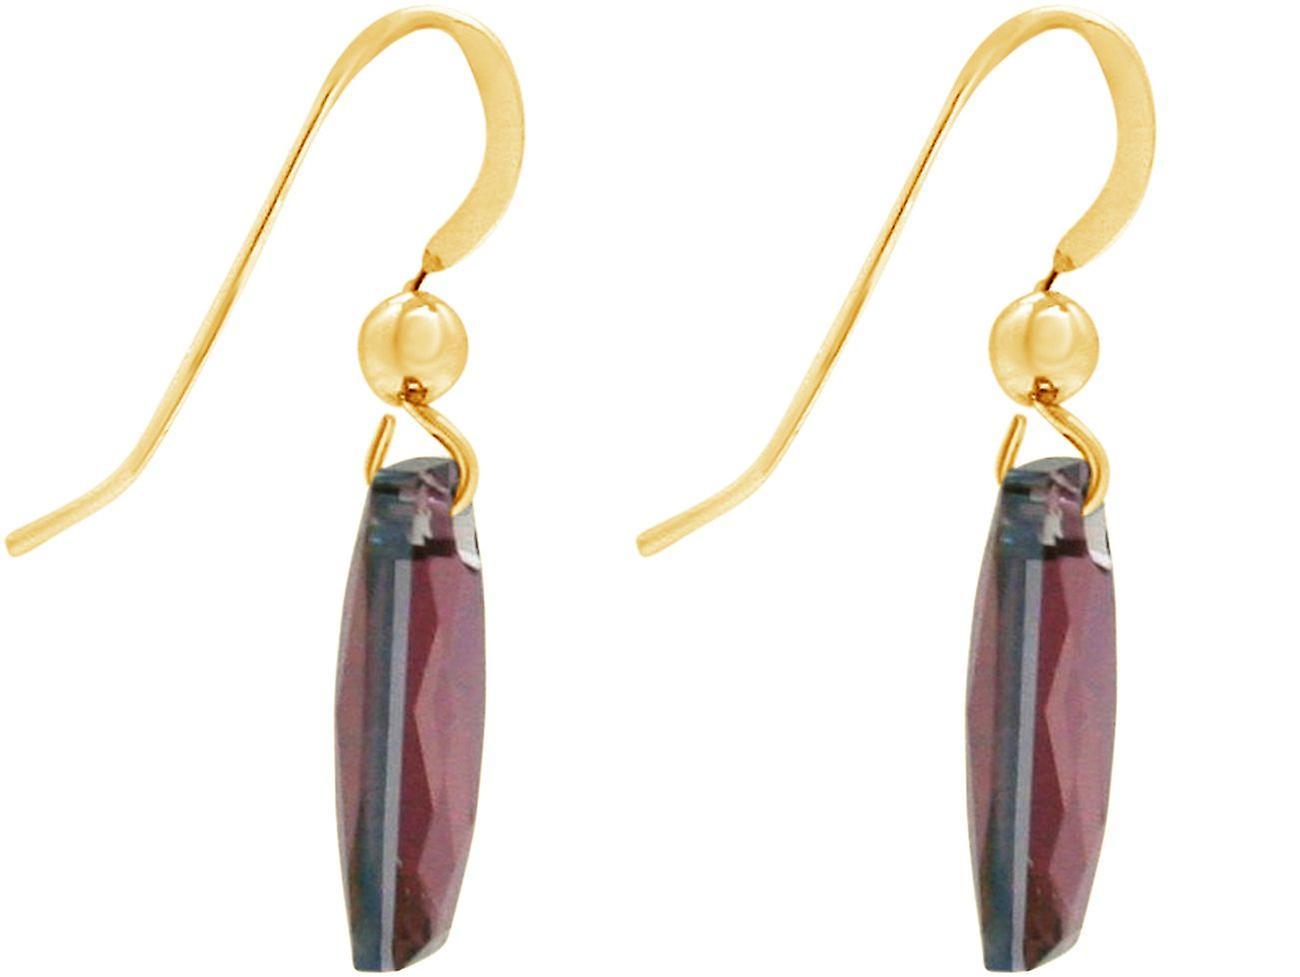 Gemshine Ohrringe SWAROVSKI ELEMENTS. 925 Silber oder vergoldet - Amethyst